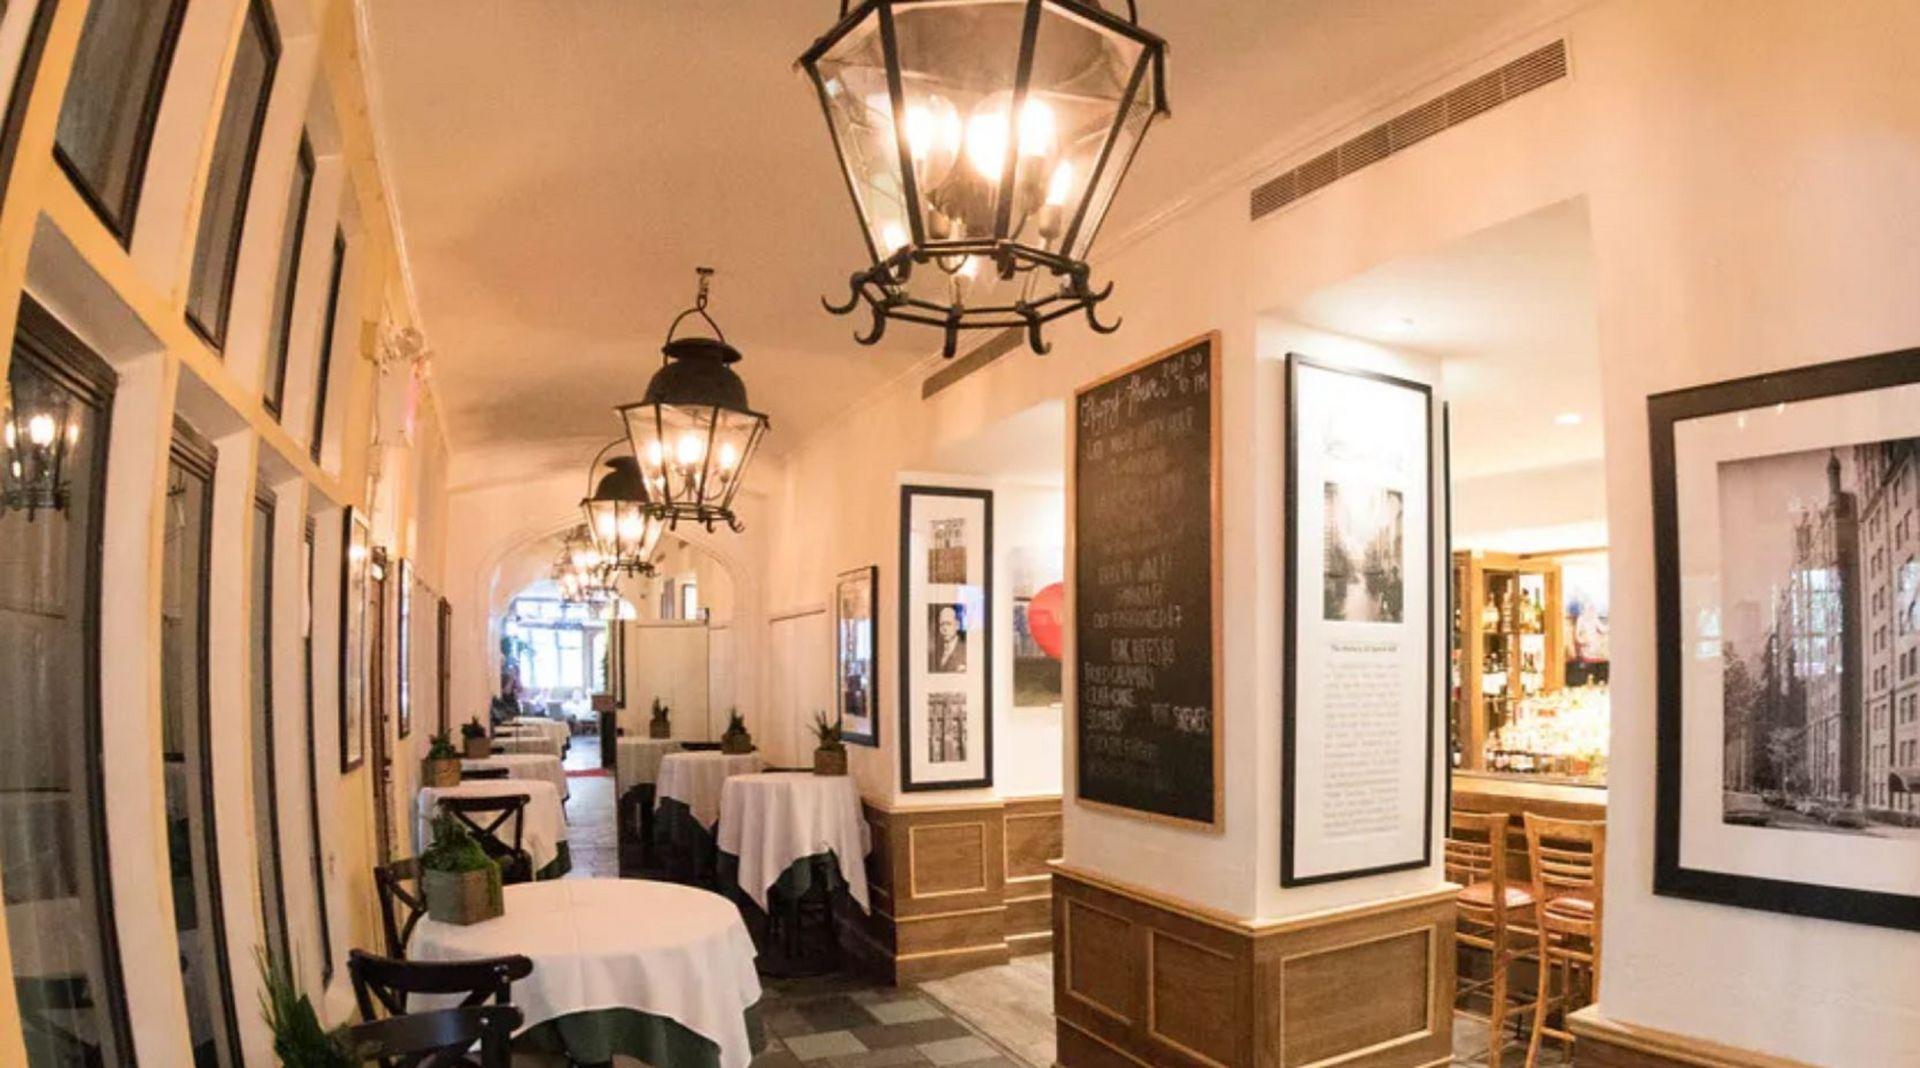 Tudor City Steakhouse - Bar, Lounge